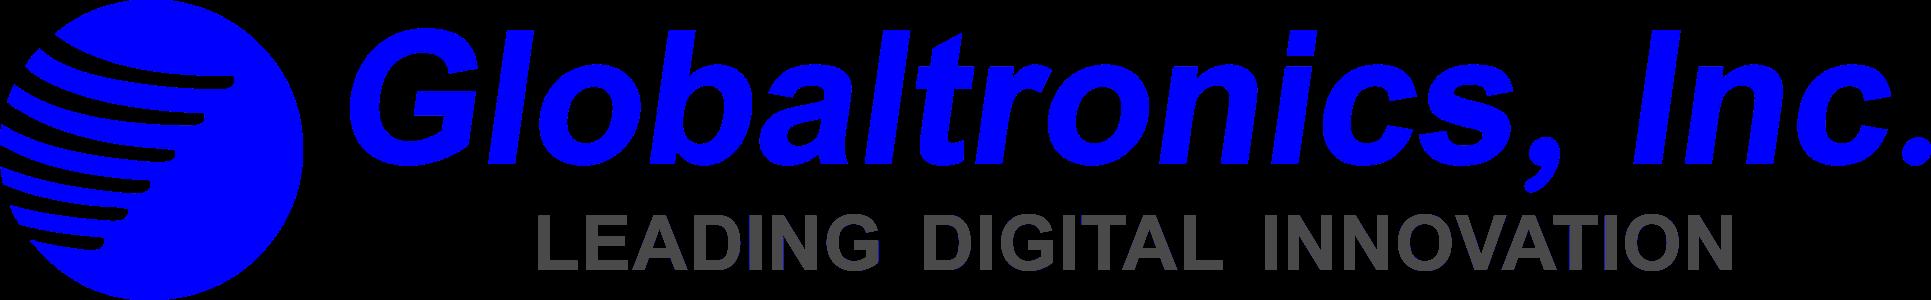 Globaltronics Logo_resized